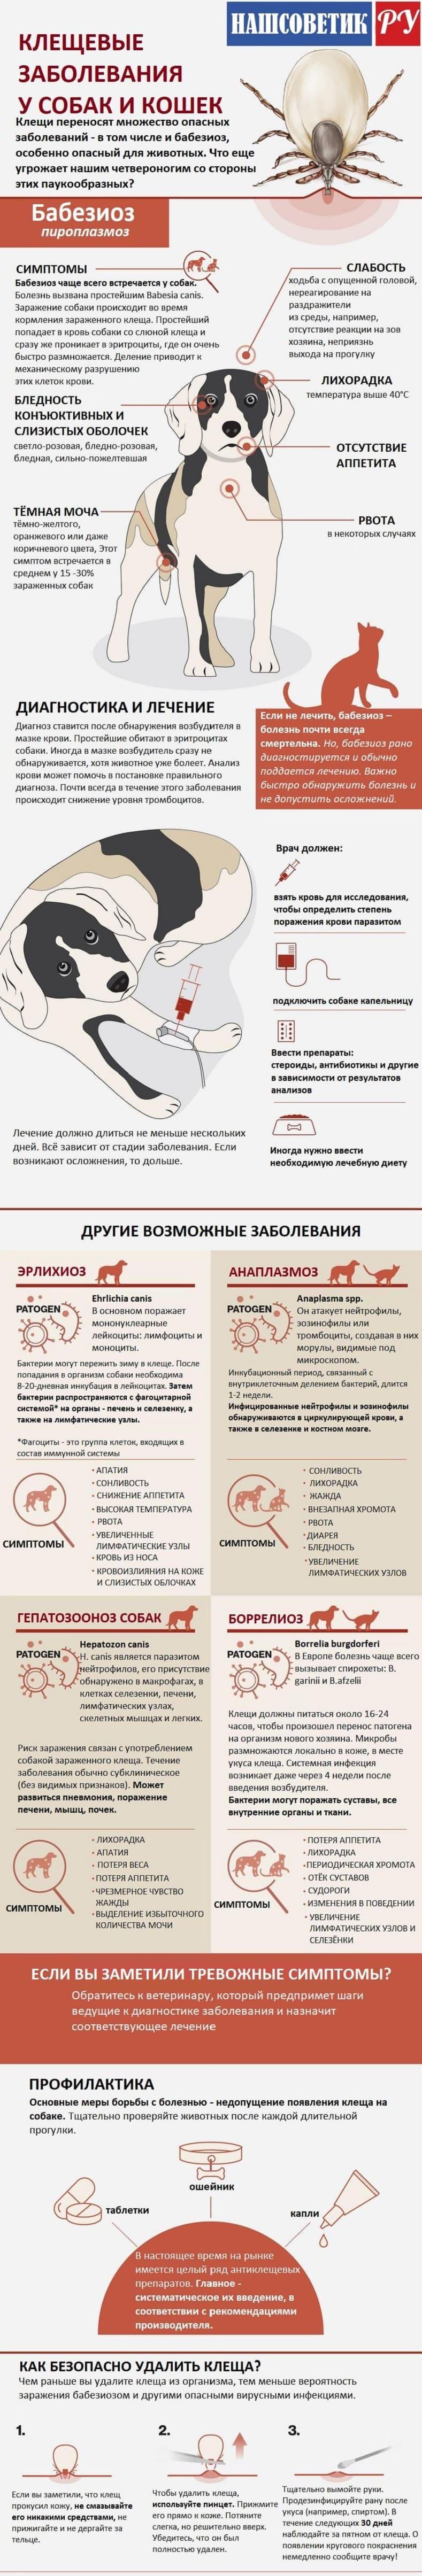 Клещи у собак и кошек. Инфографика